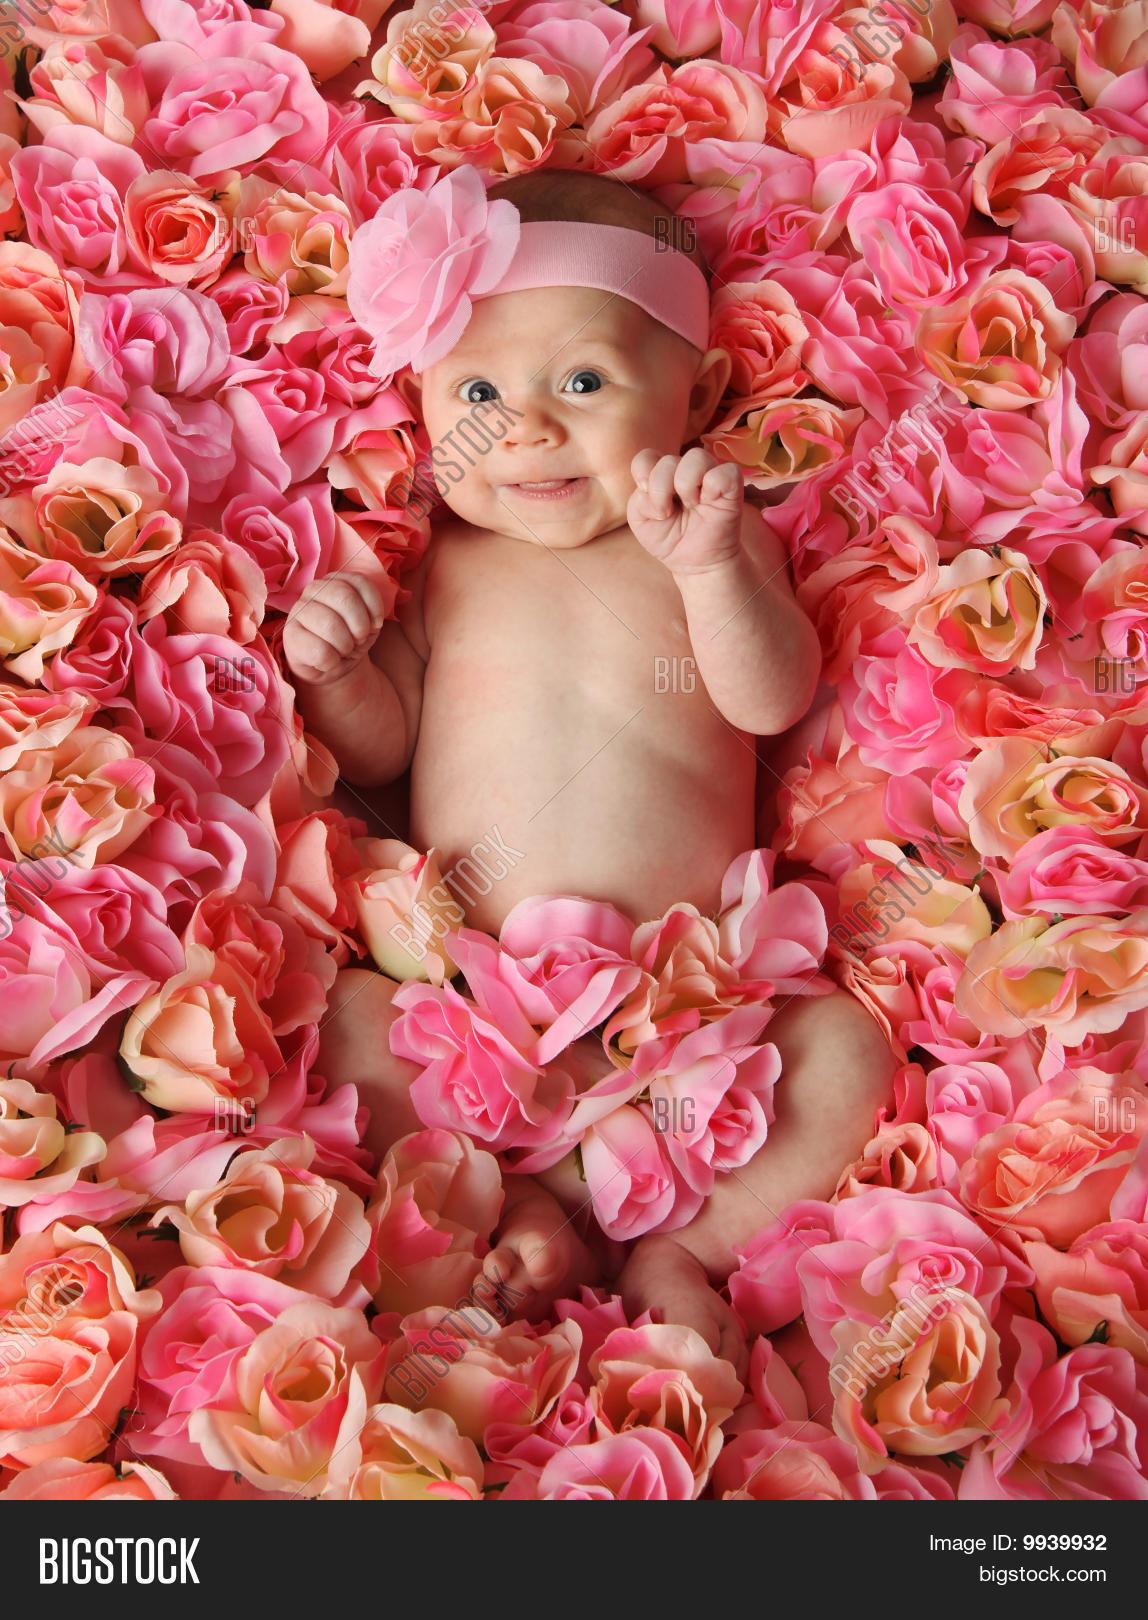 Поздравление ребёнок на фото